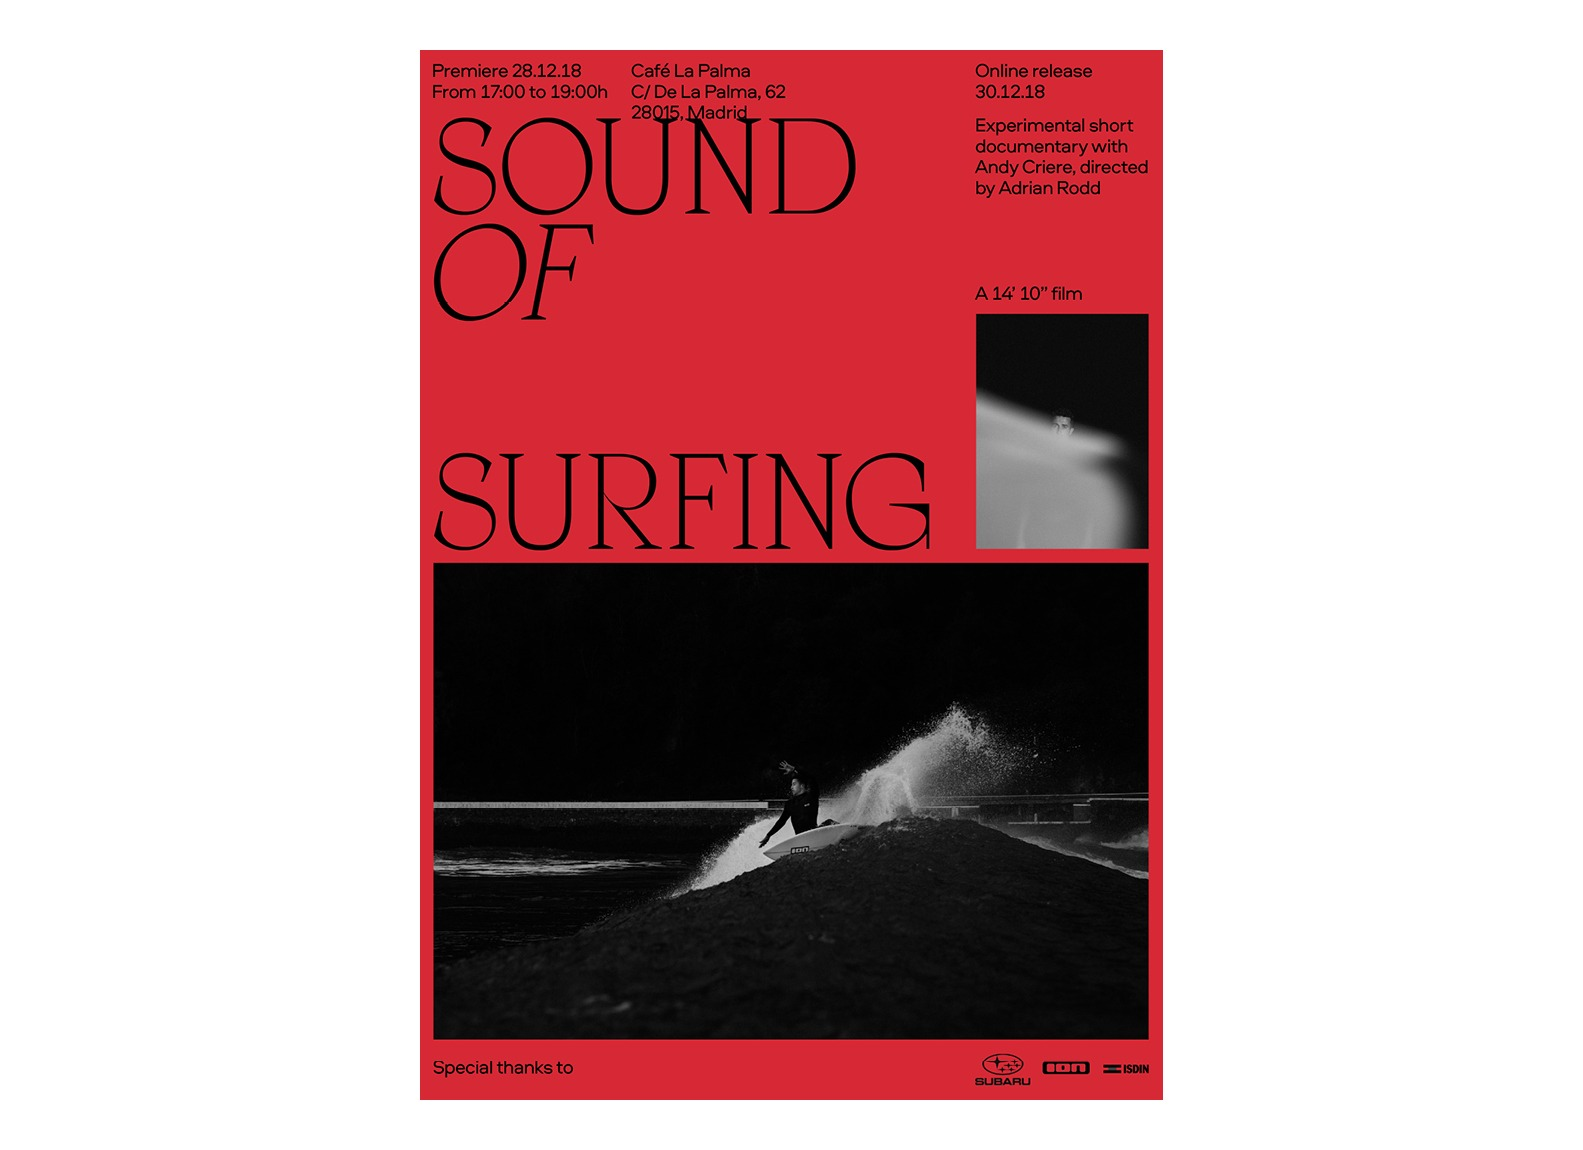 soundofsurfing-bruma11